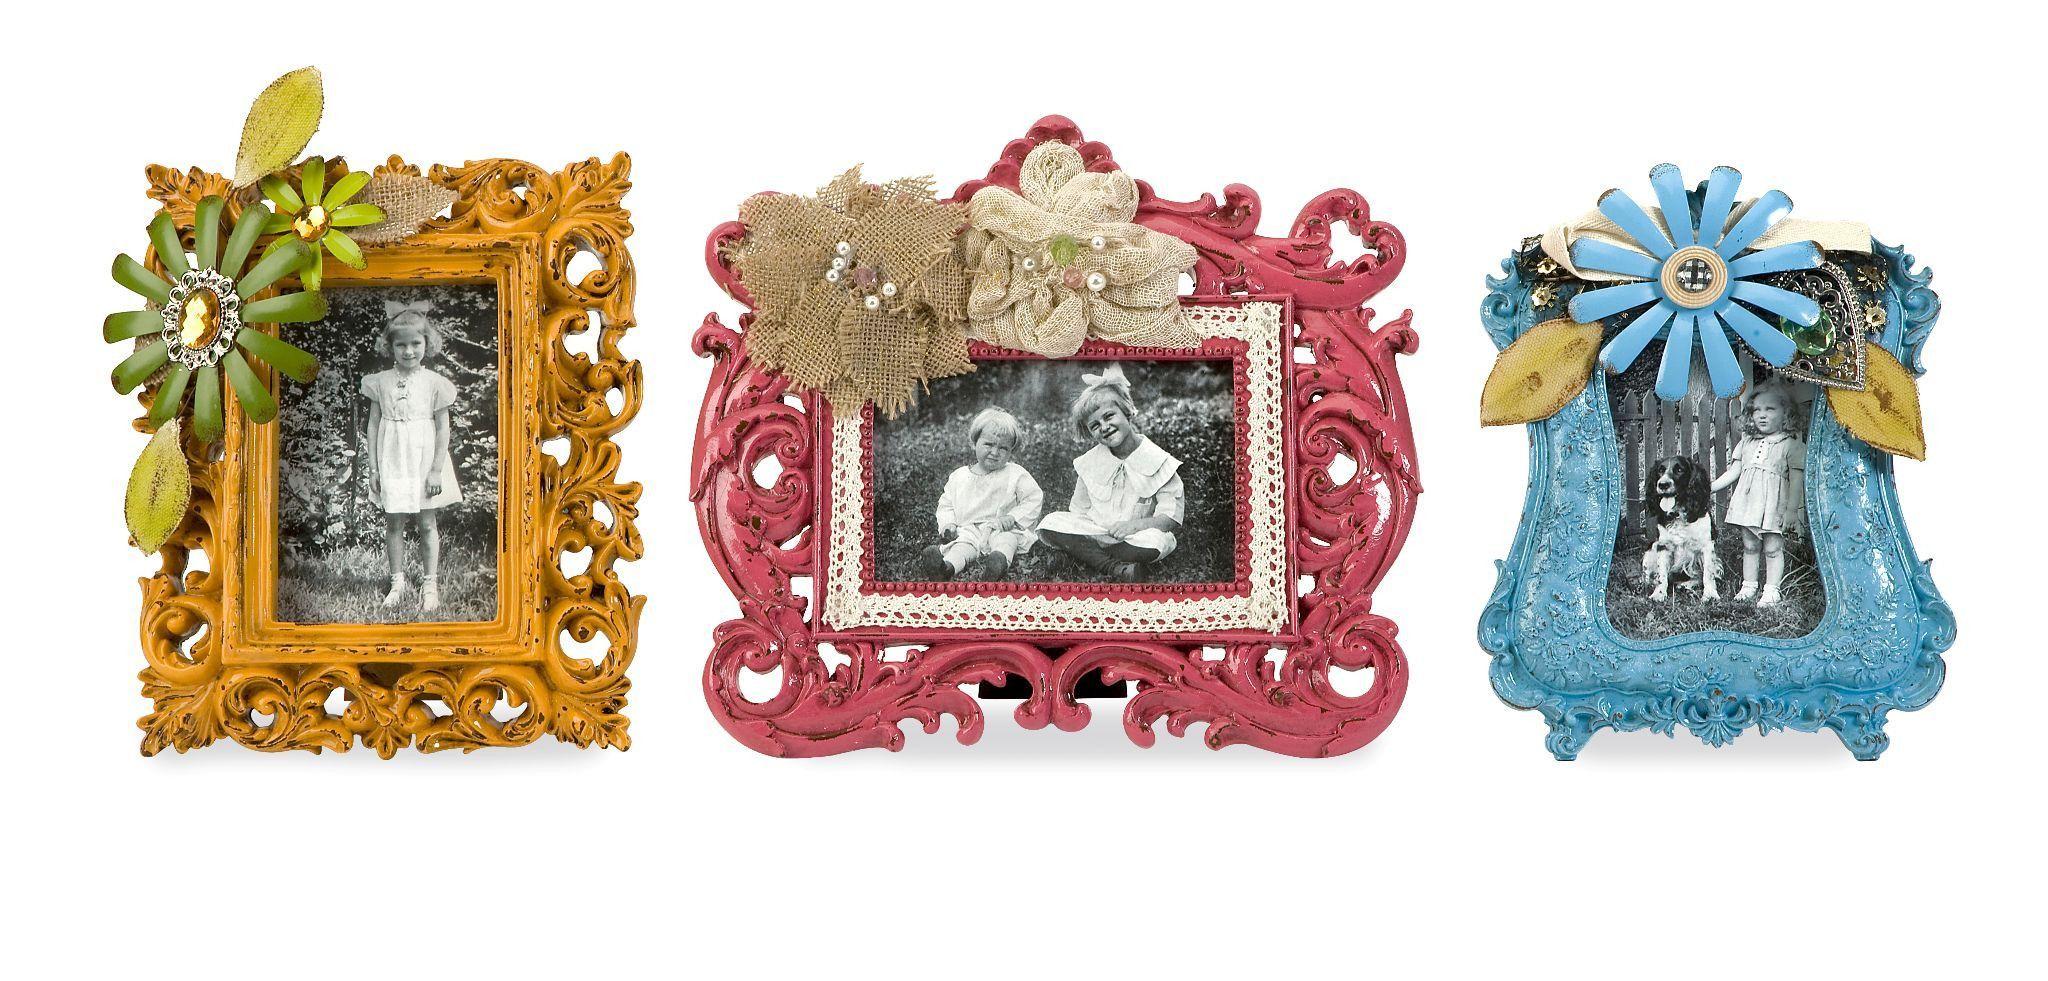 Abbbott Embellished Photo Frames - Set of 3 | Products | Pinterest ...